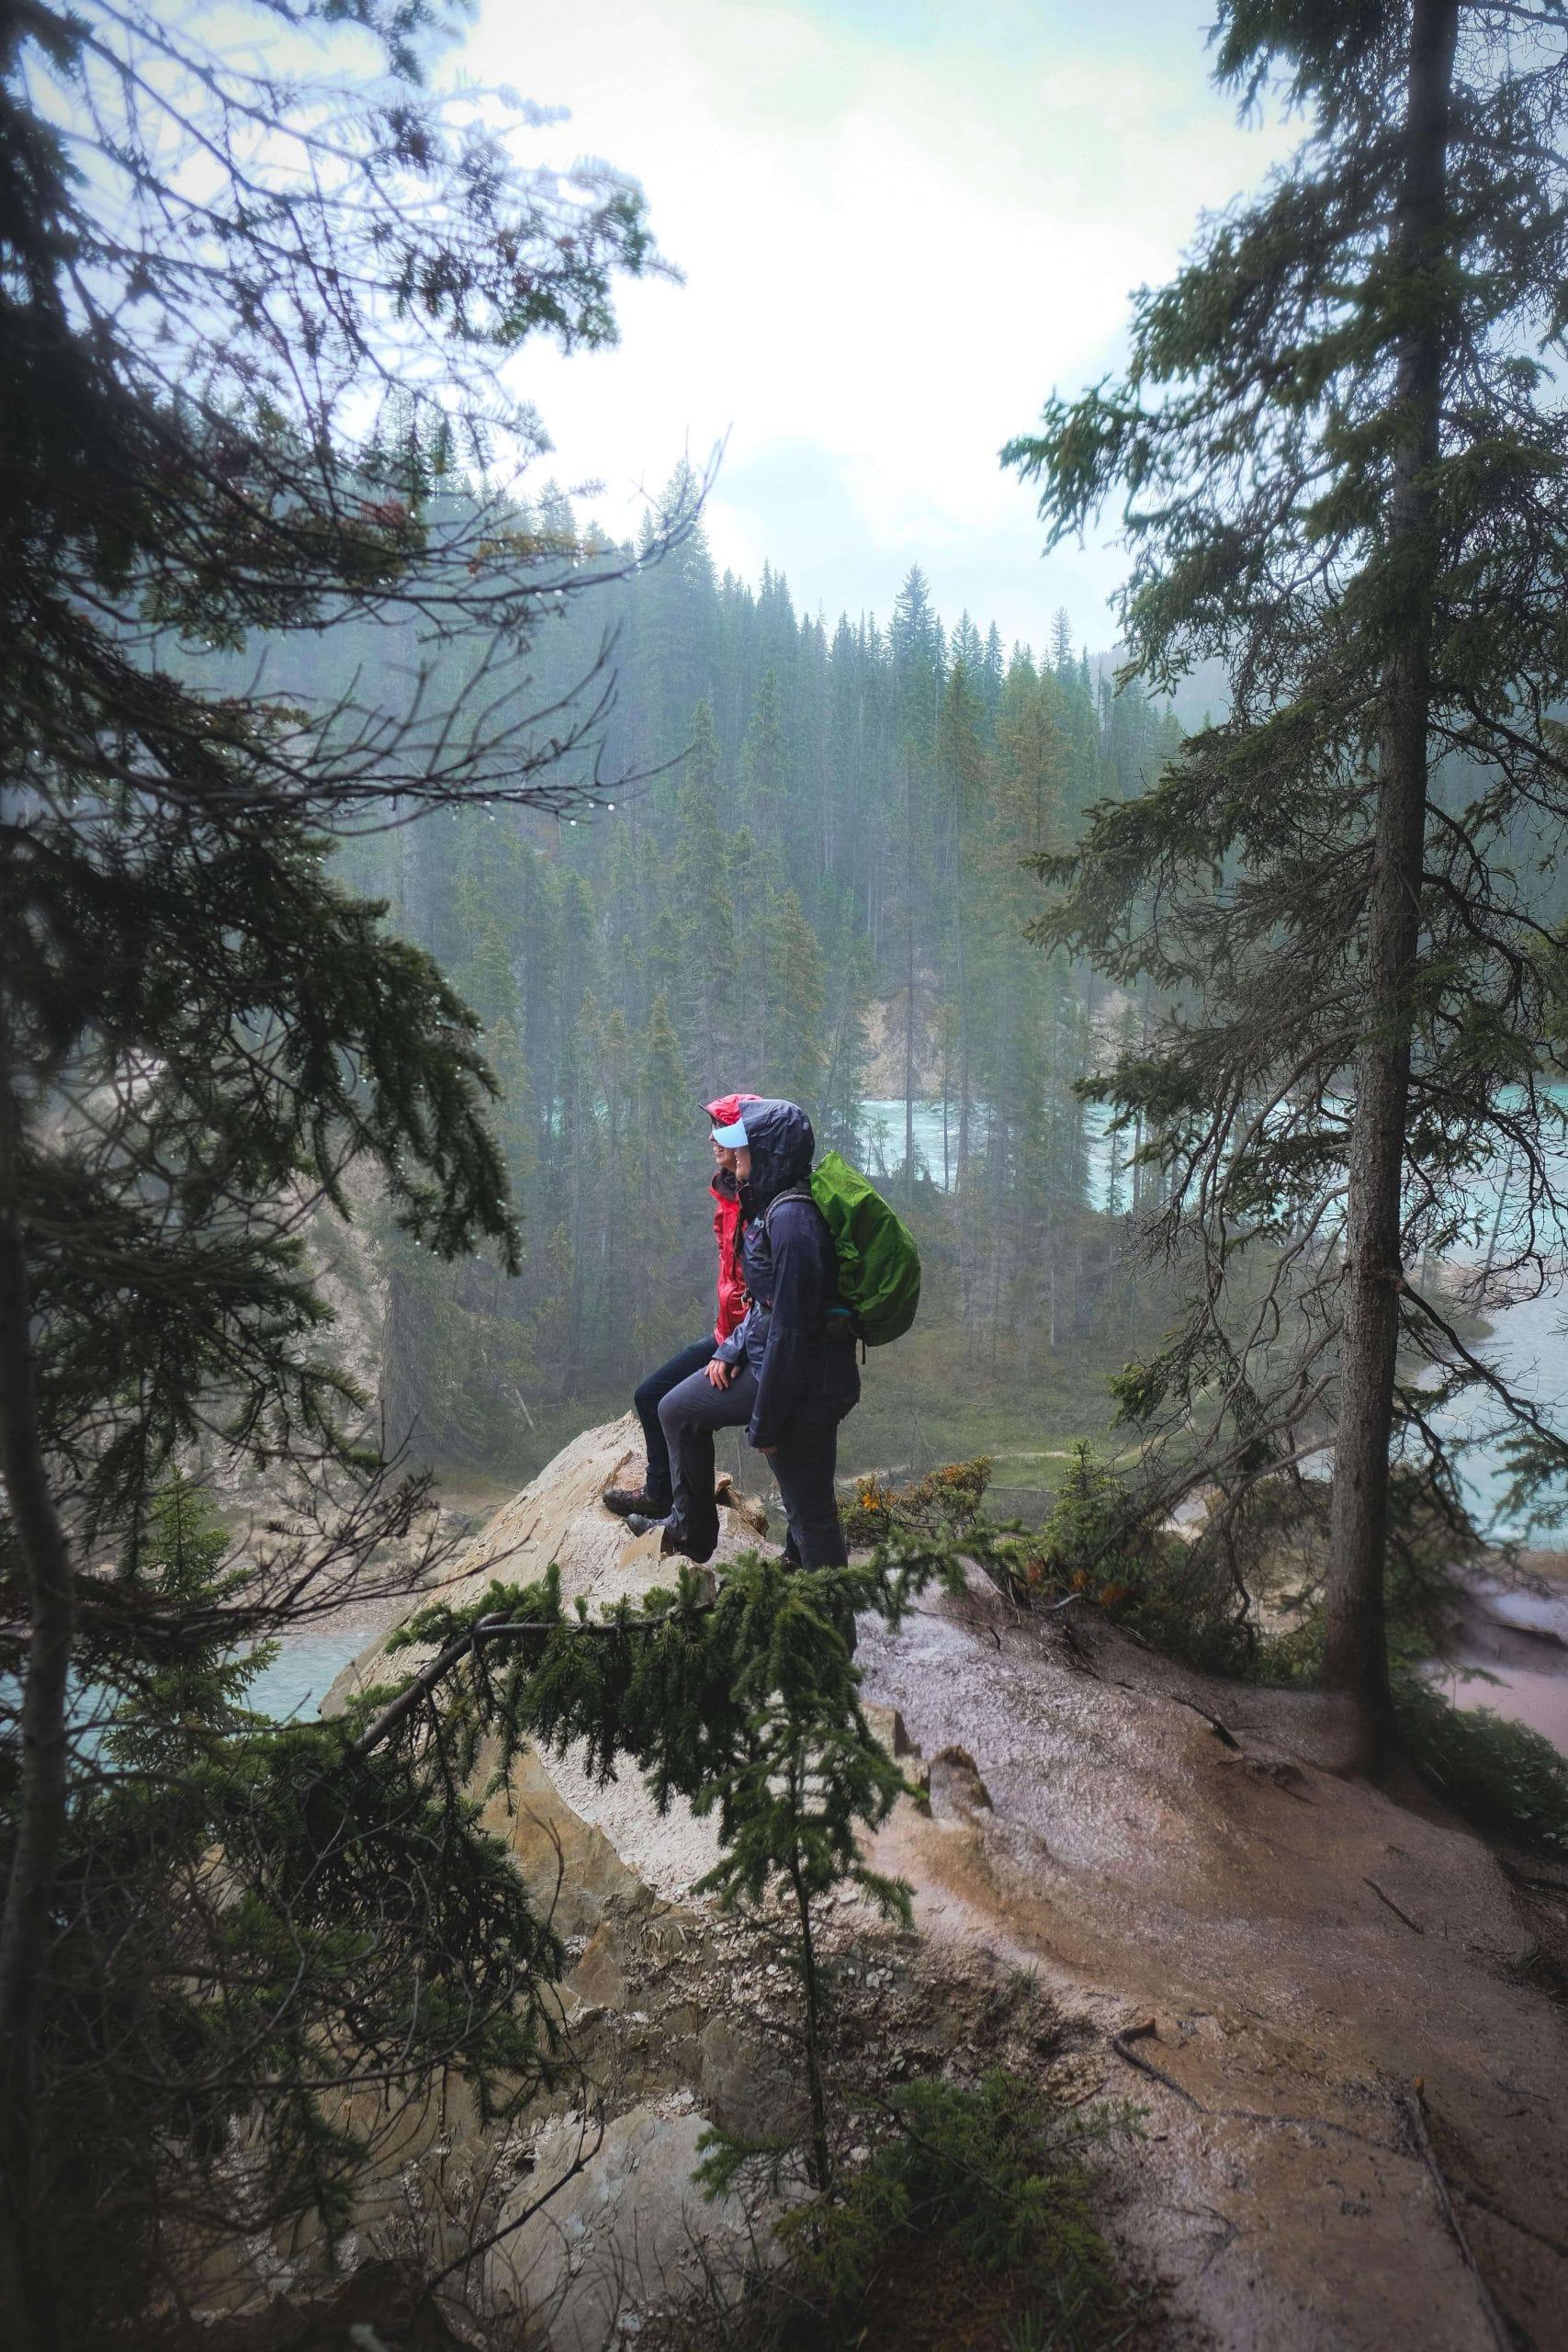 Hiking to the bottom of Wapta Falls